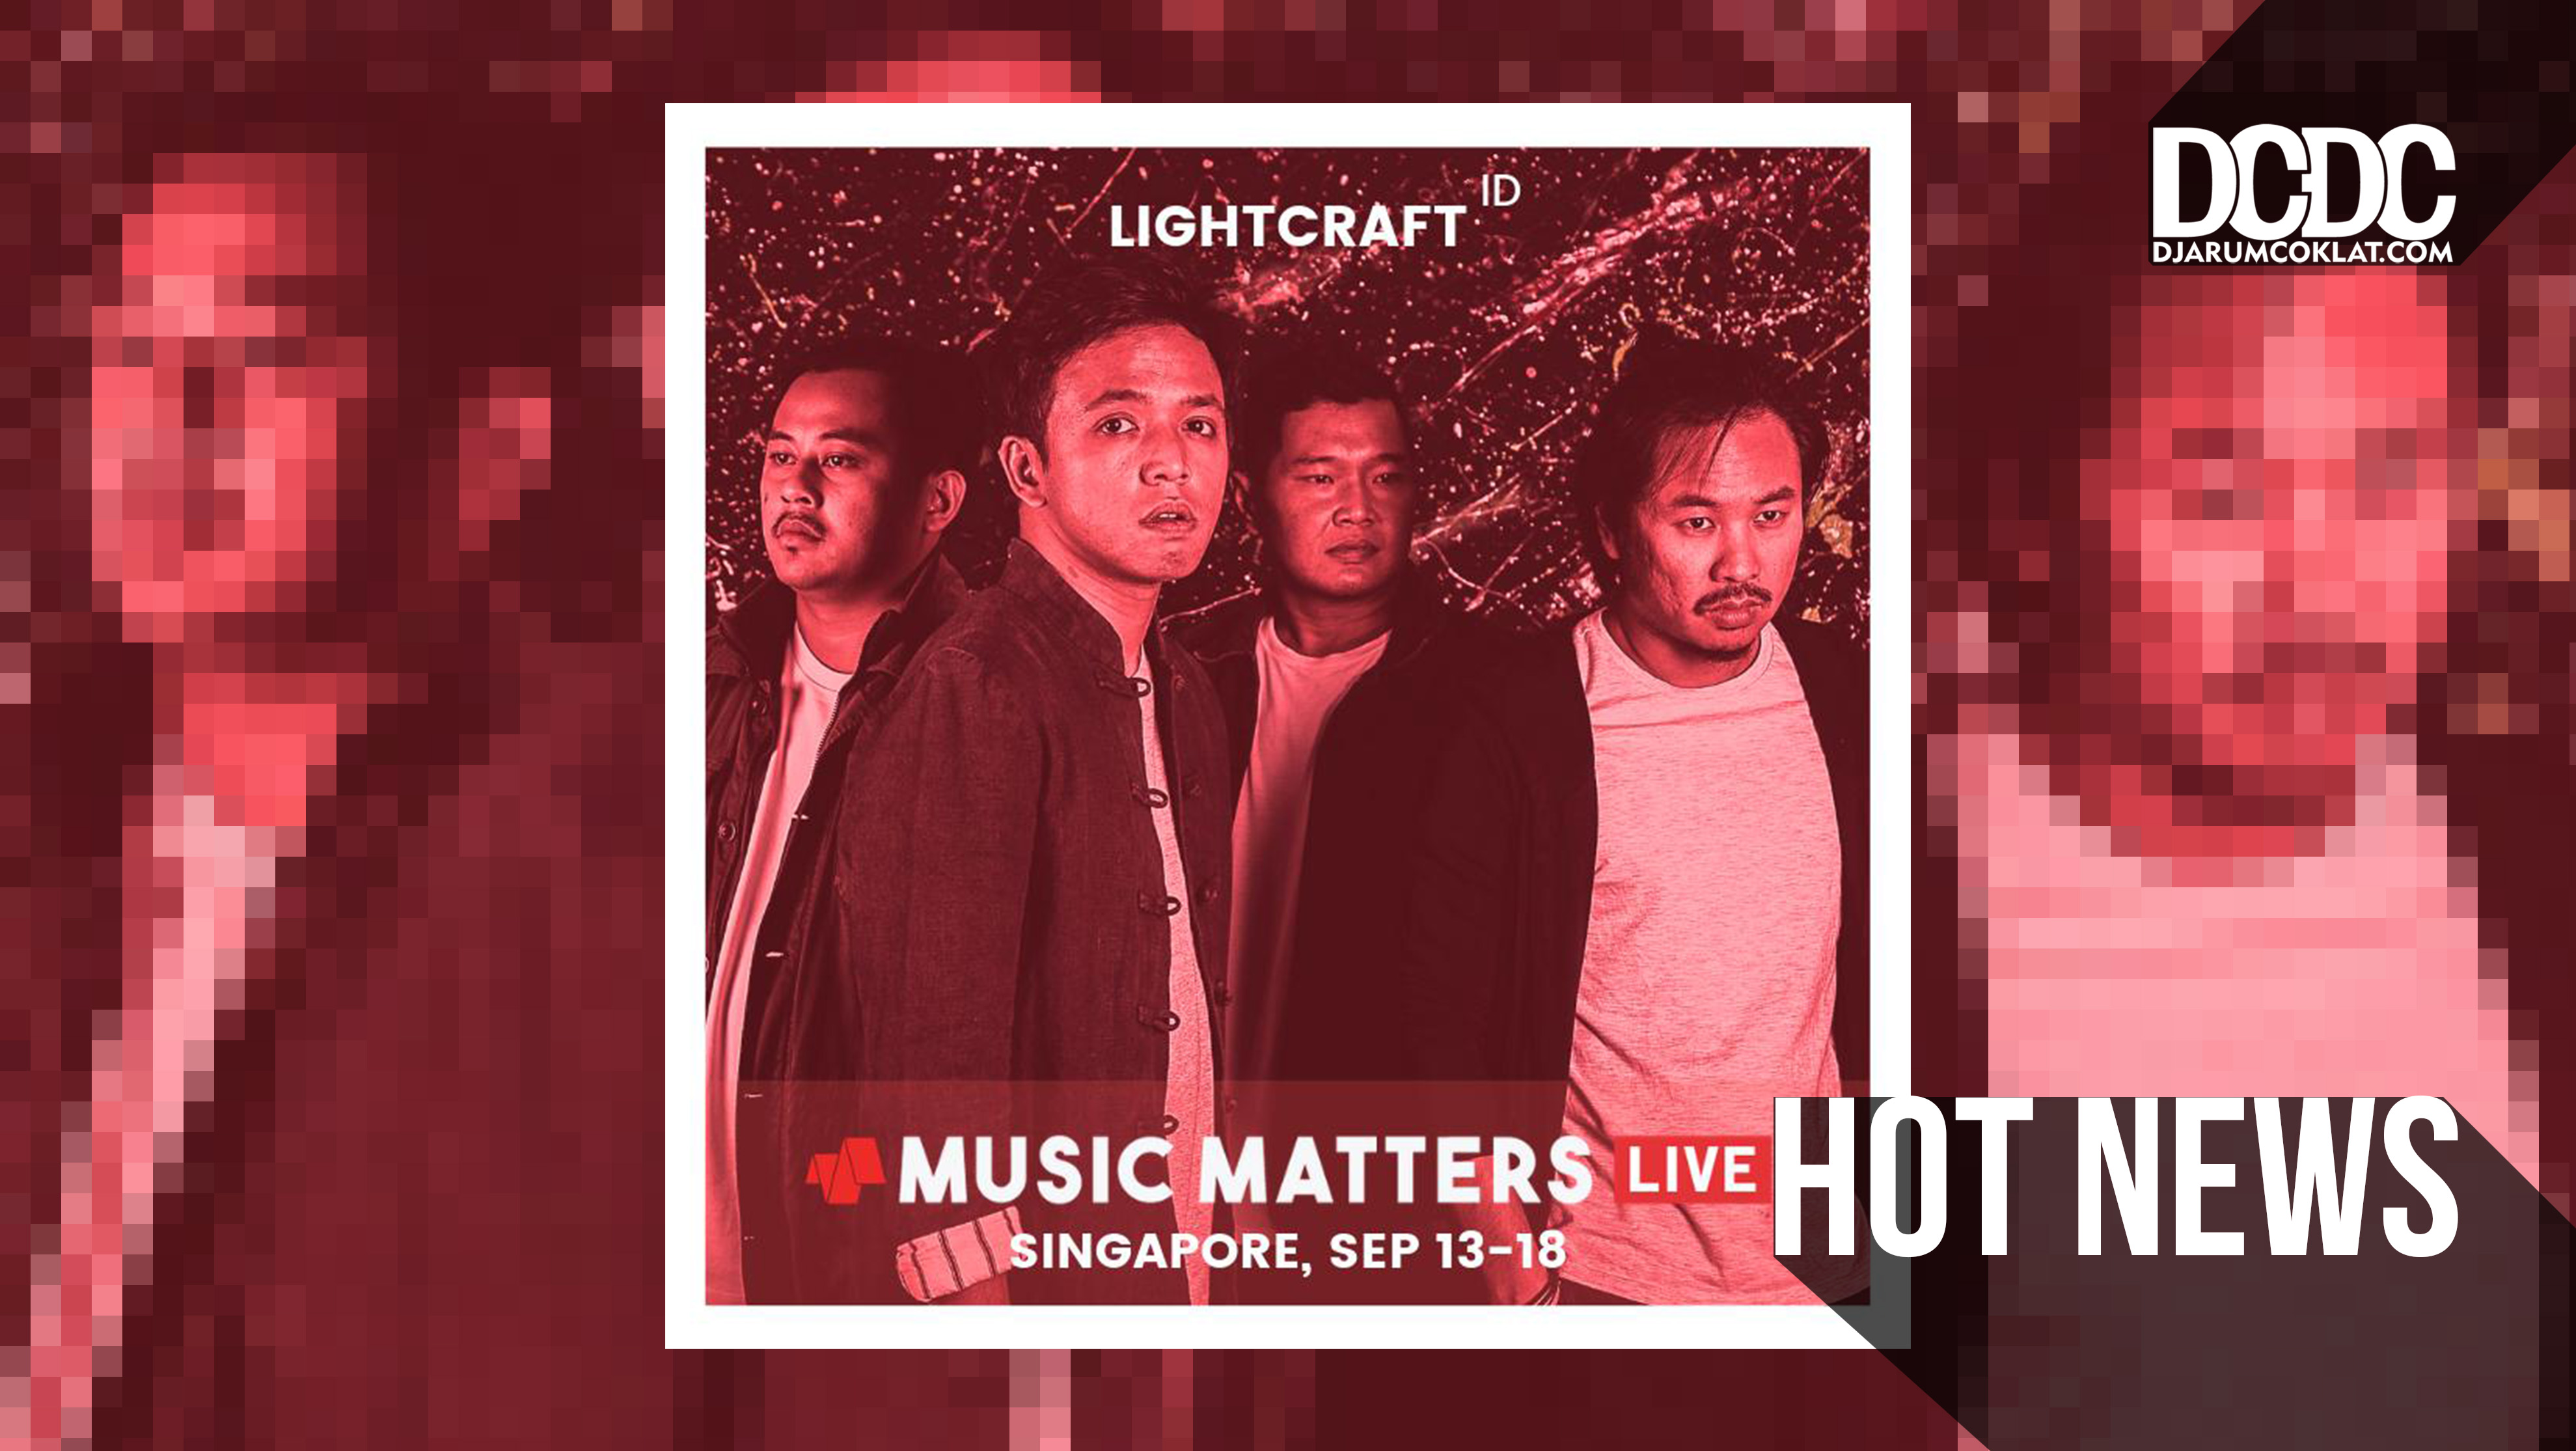 Singapura Kembali Mengundang lightcraft di Music Matters Live